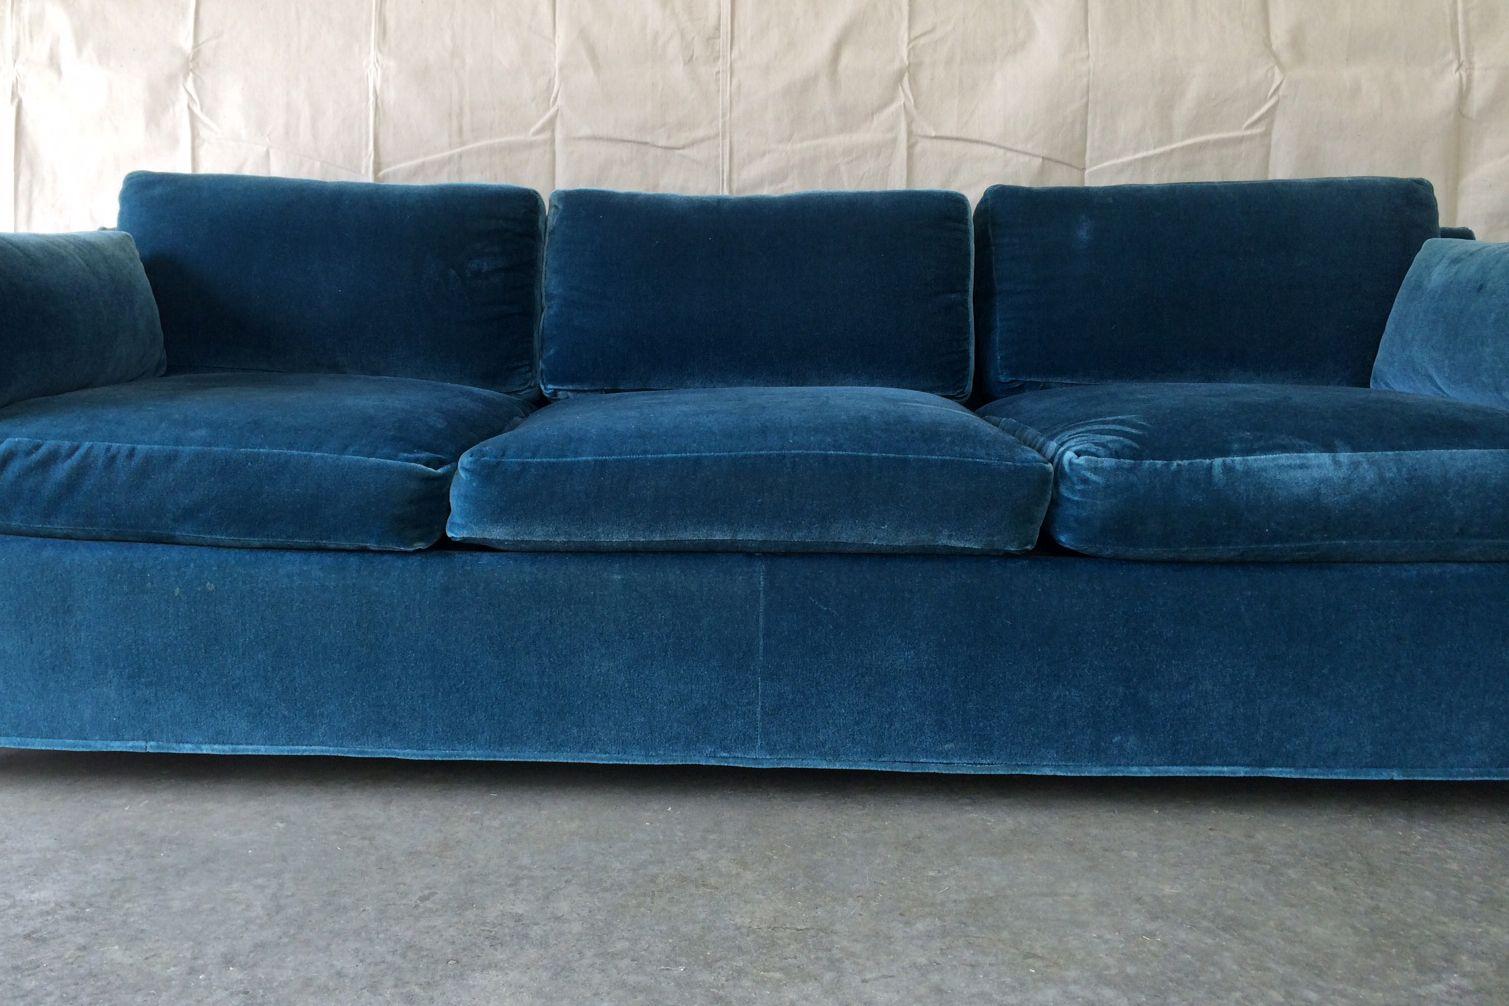 Mid Century Prussian Blue Velvet Sofa Chairish : 777d3475 ac22 4c02 b51d bbf71d43f26easpectfitampwidth640ampheight640 from www.chairish.com size 640 x 640 jpeg 39kB